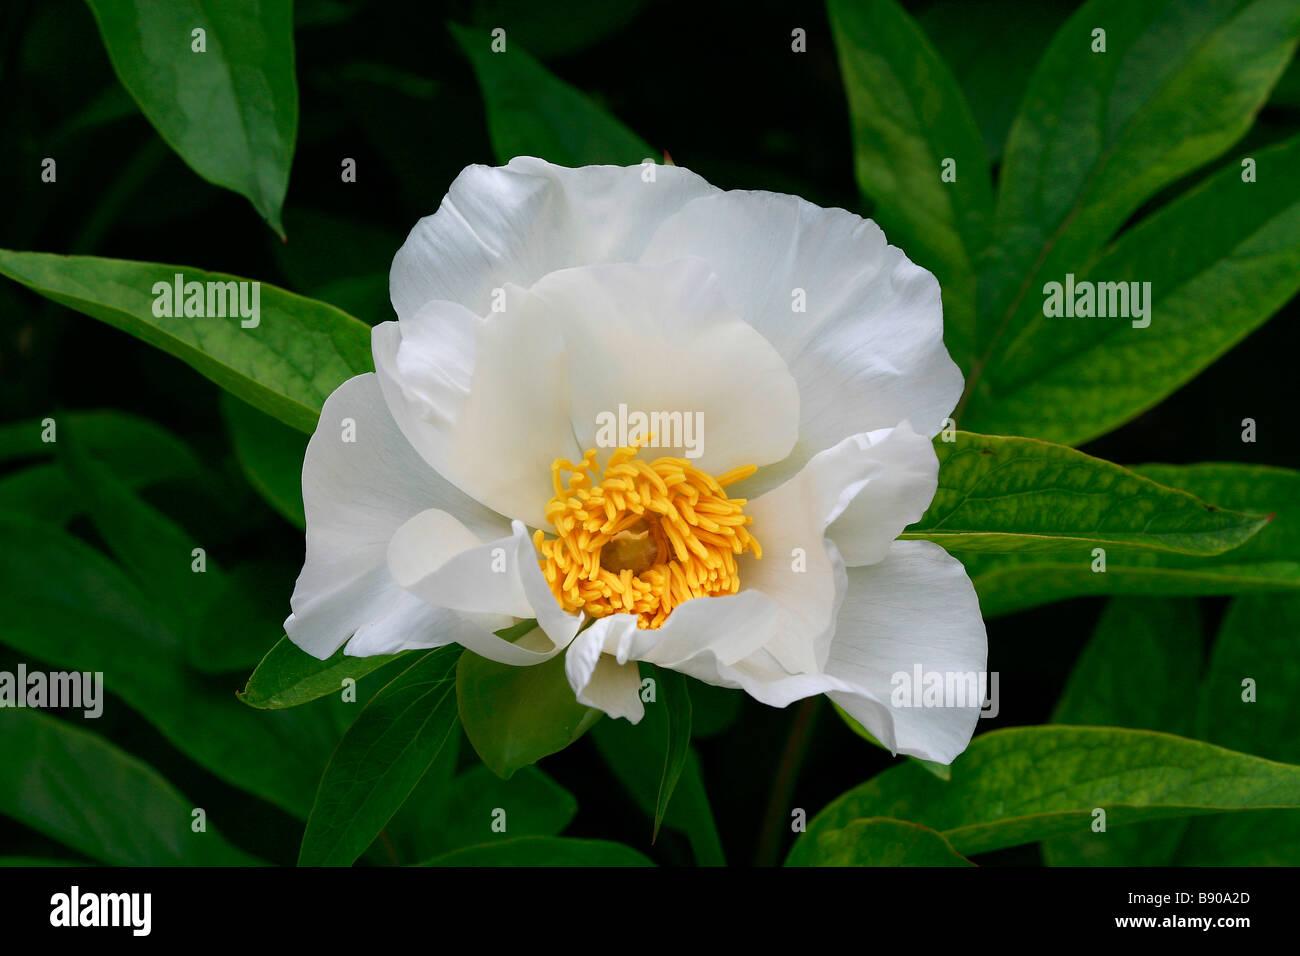 Paeonia emodi - Stock Image